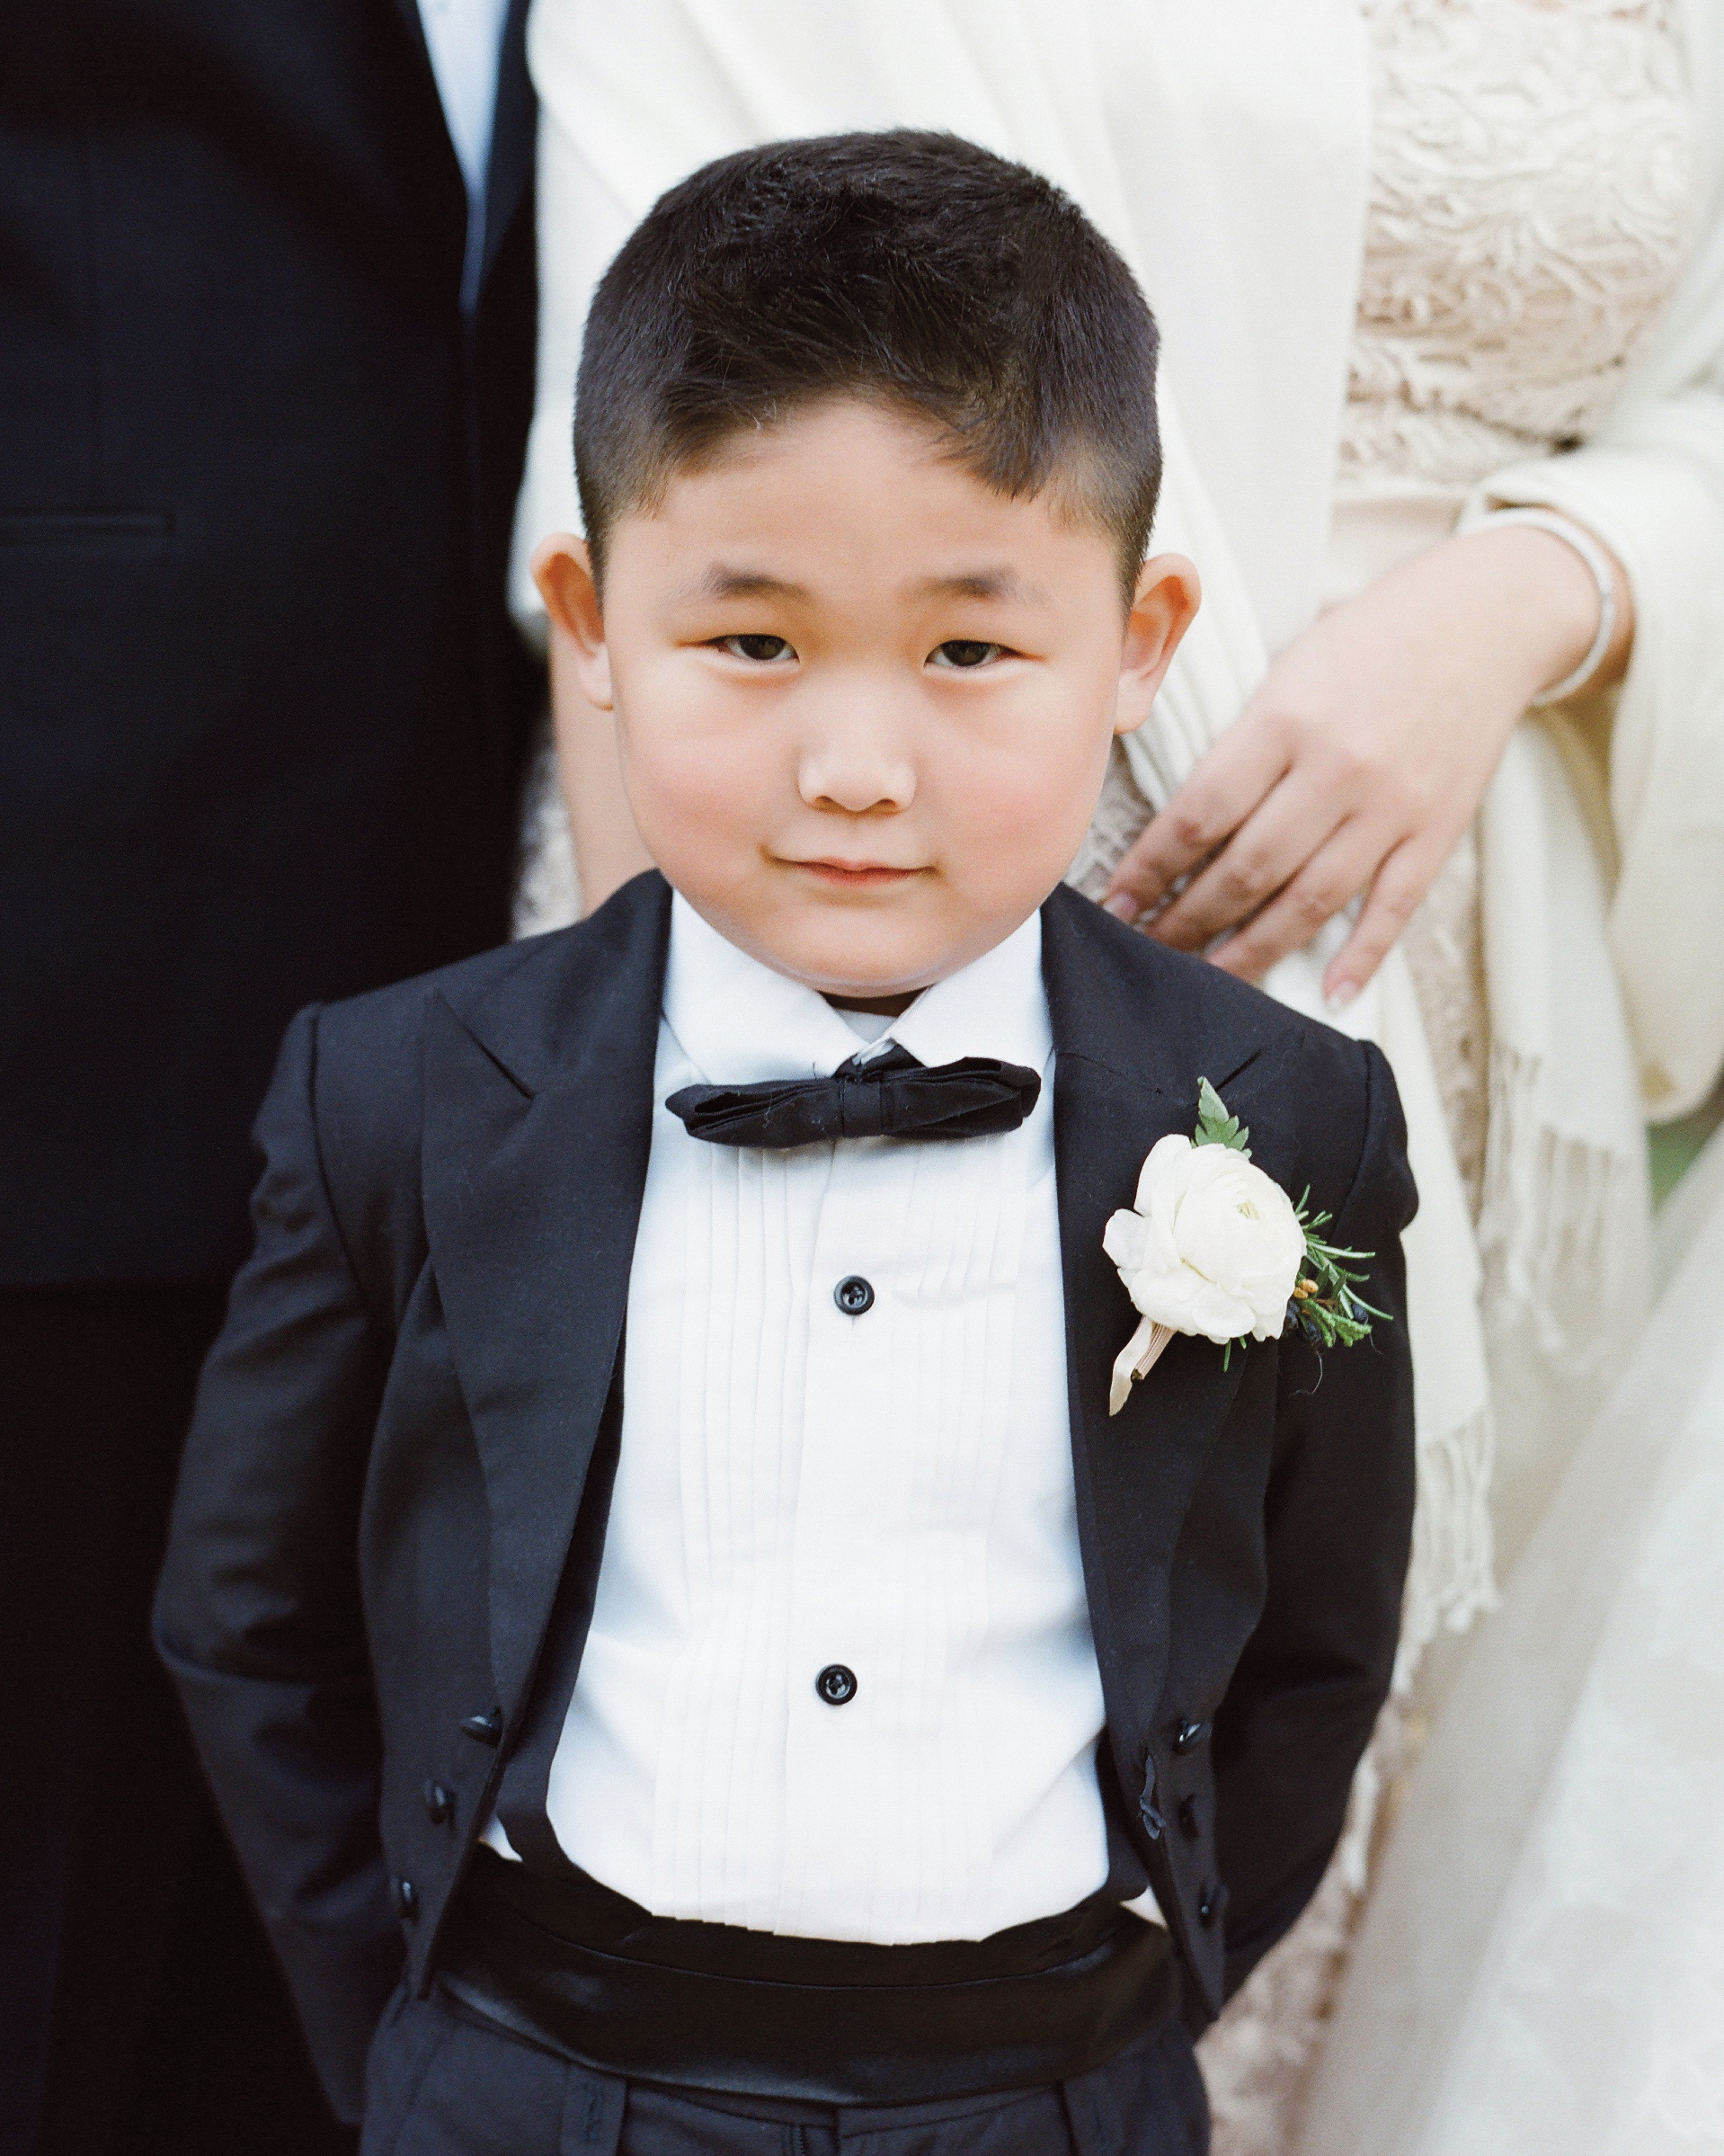 adriana-han-wedding-57450008-s111814.jpg